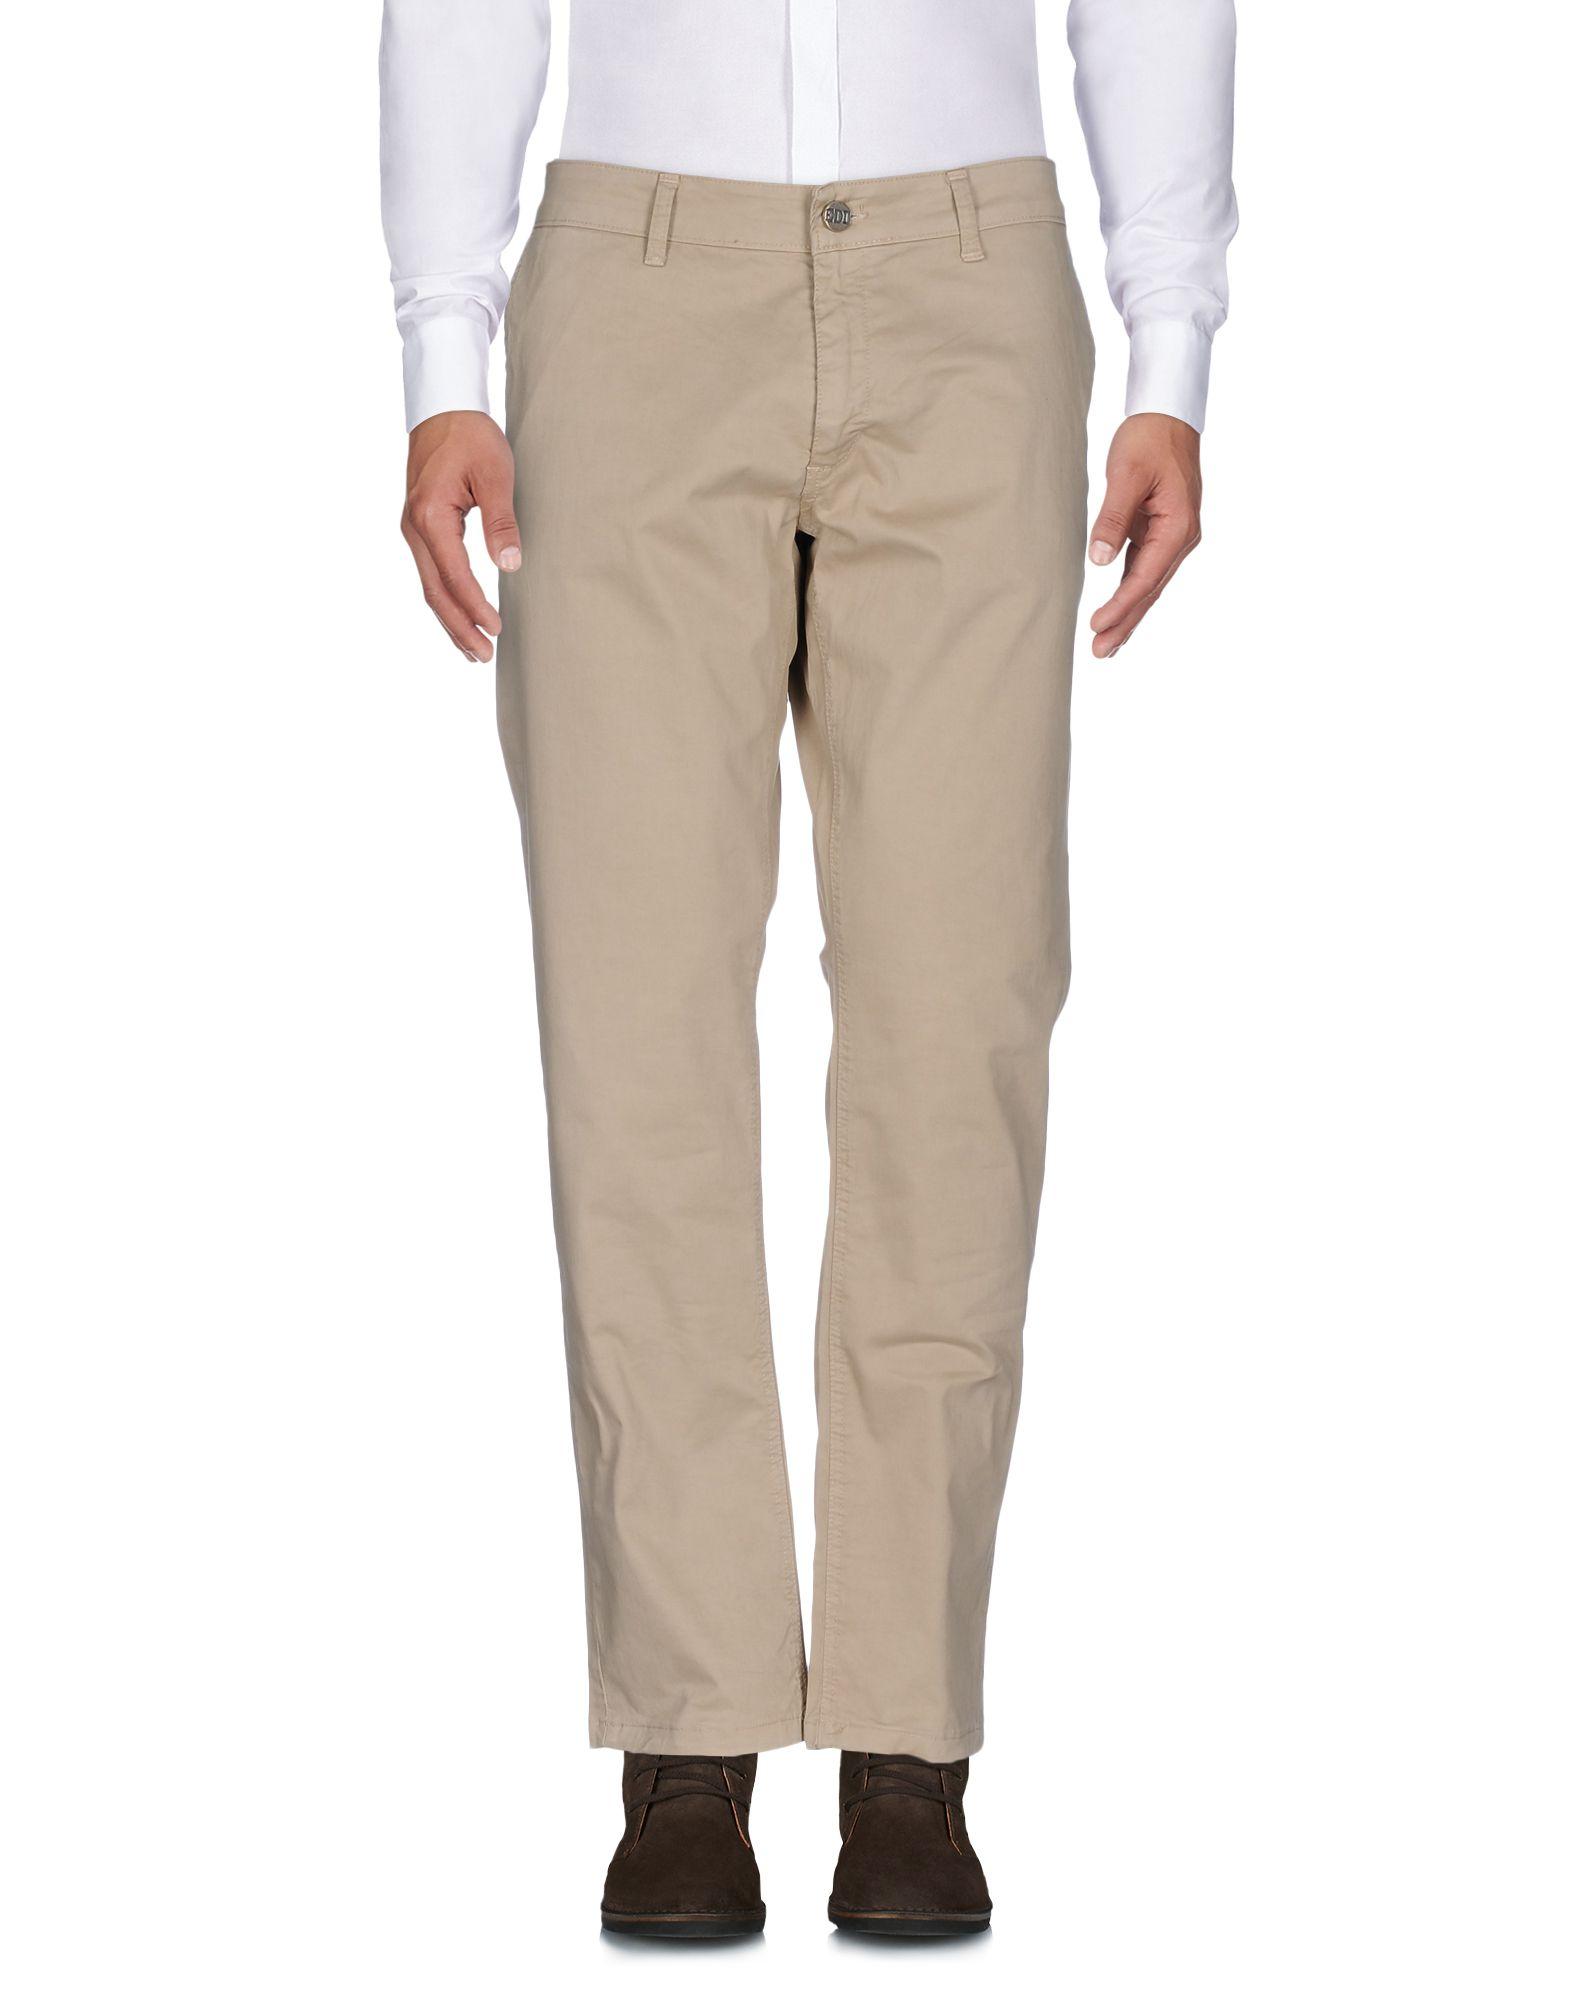 EREDI DEL DUCA Повседневные брюки magazzini del sale повседневные брюки